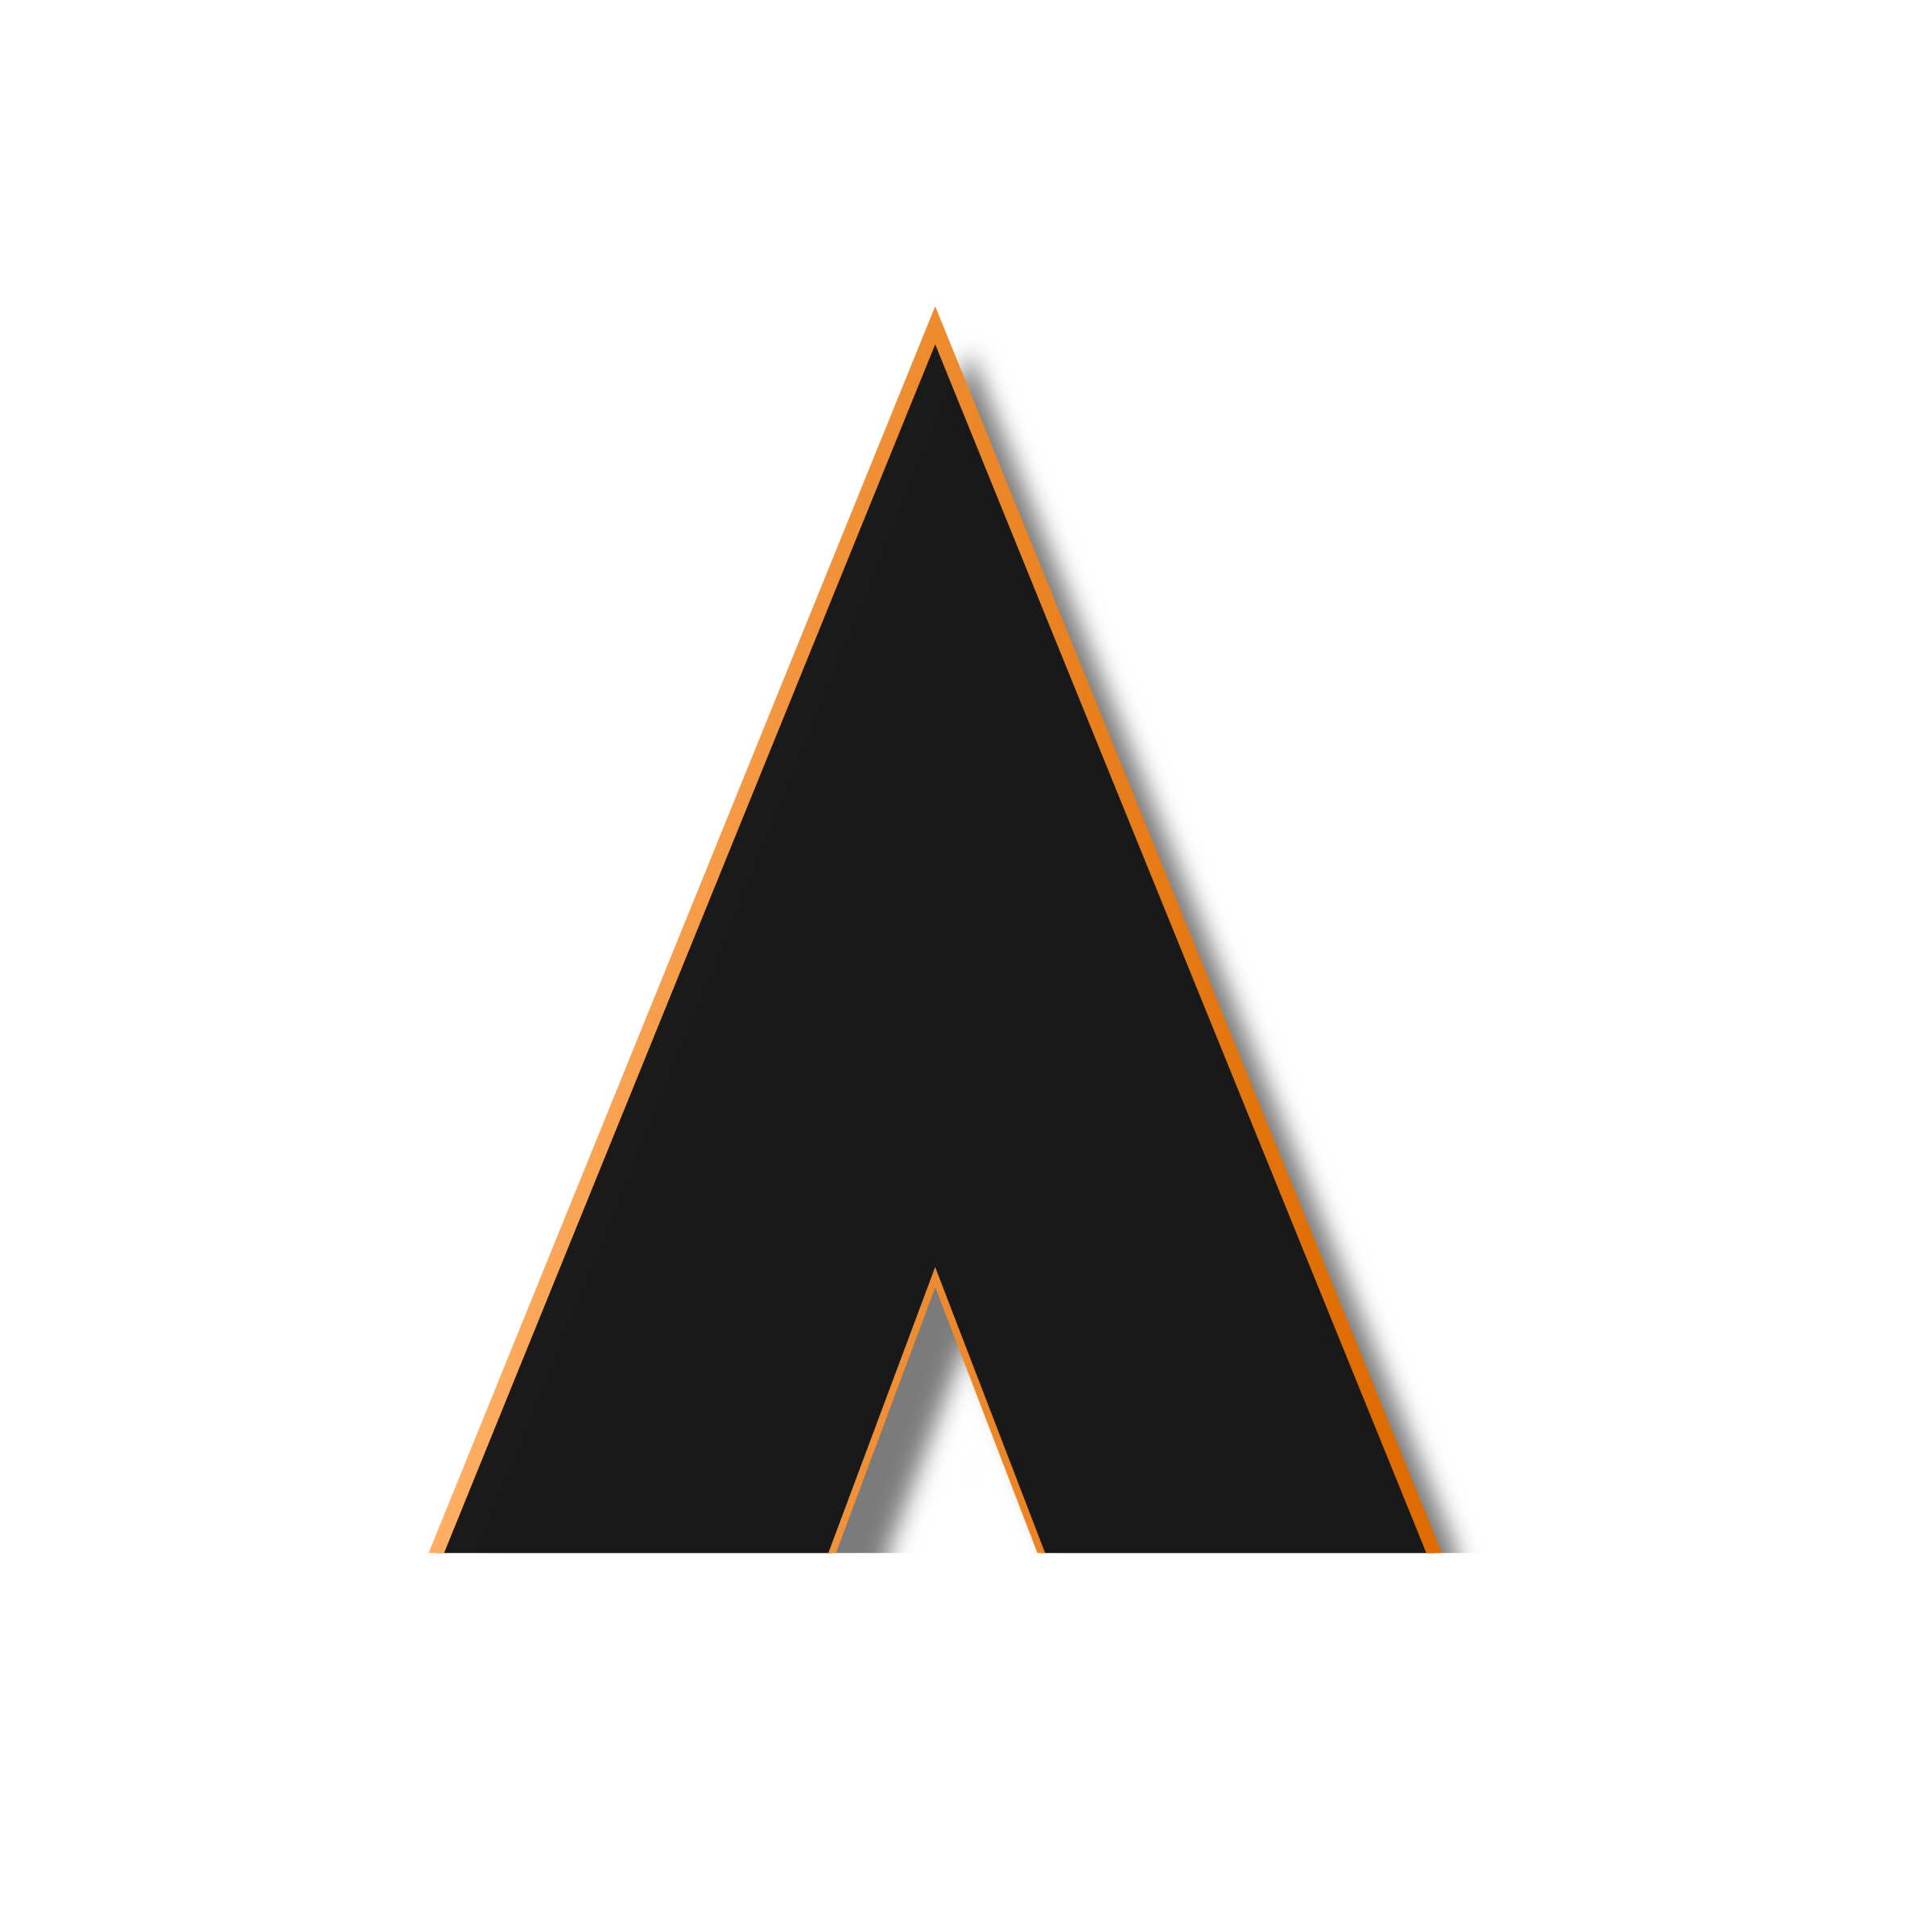 Clock clipart triangle. Clockwork orange big image